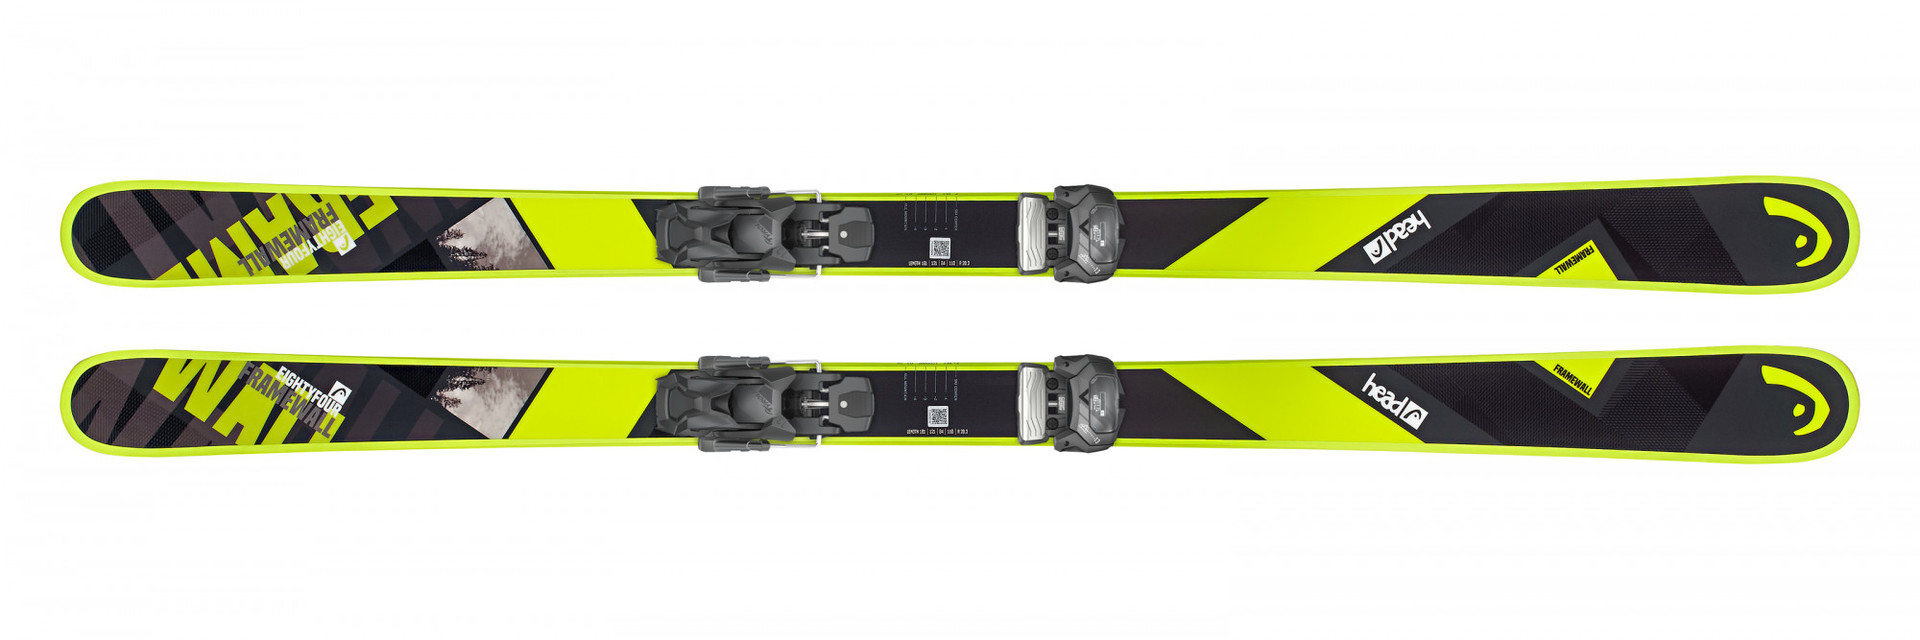 Горные лыжи Head Frame Wall + Крепление ATTACK? 13 GW  размер 181 (2019)